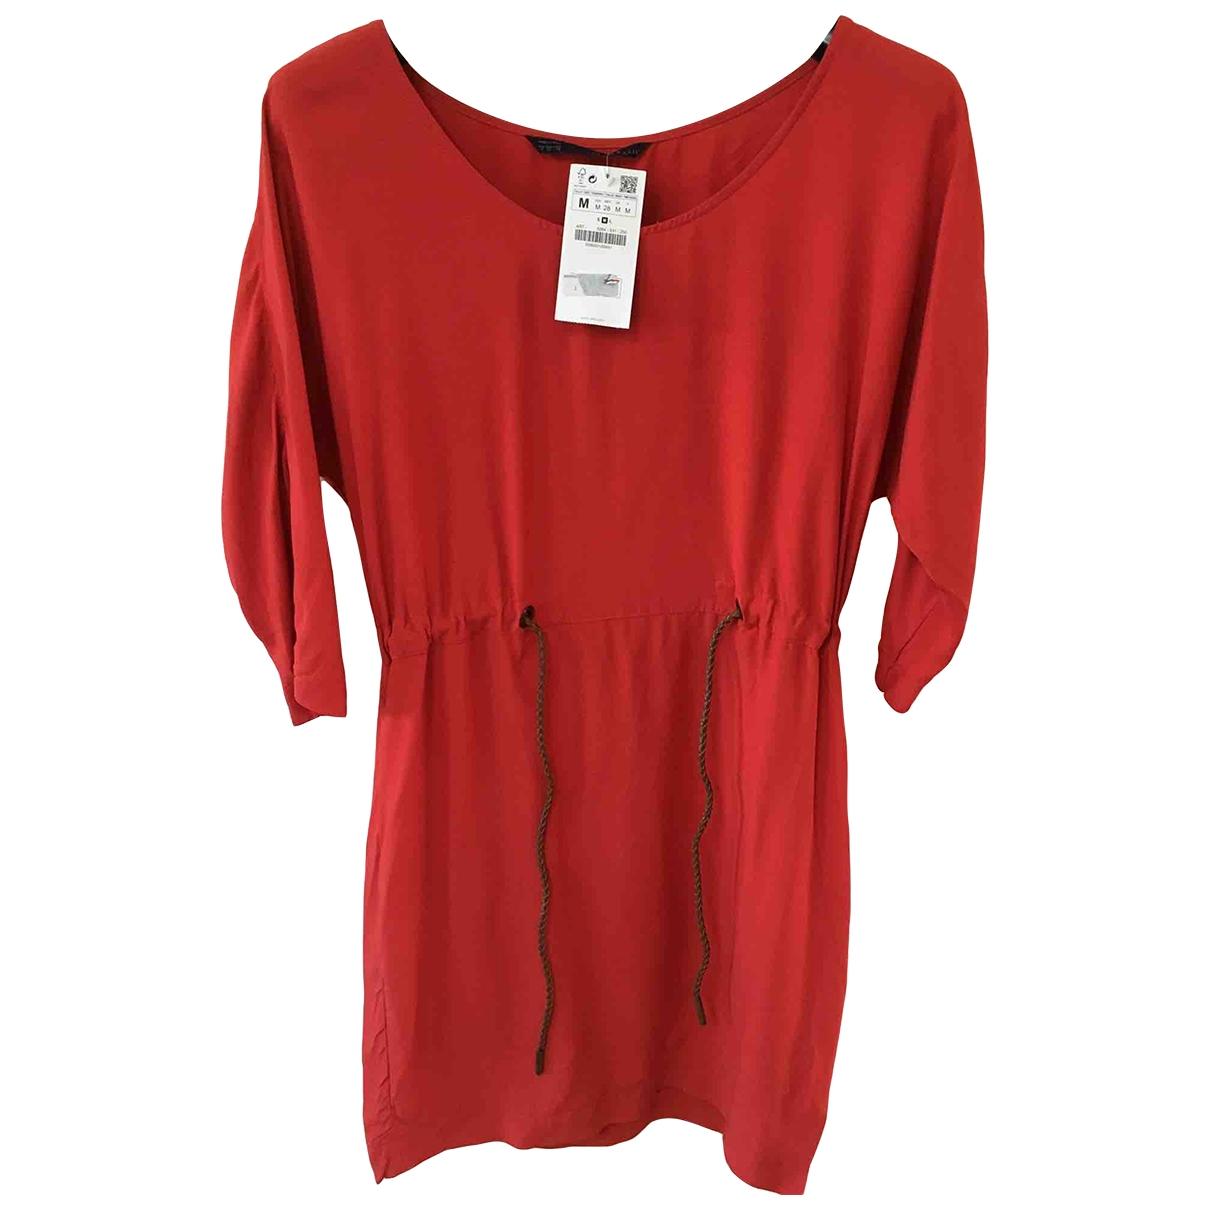 Zara \N Red dress for Women M International